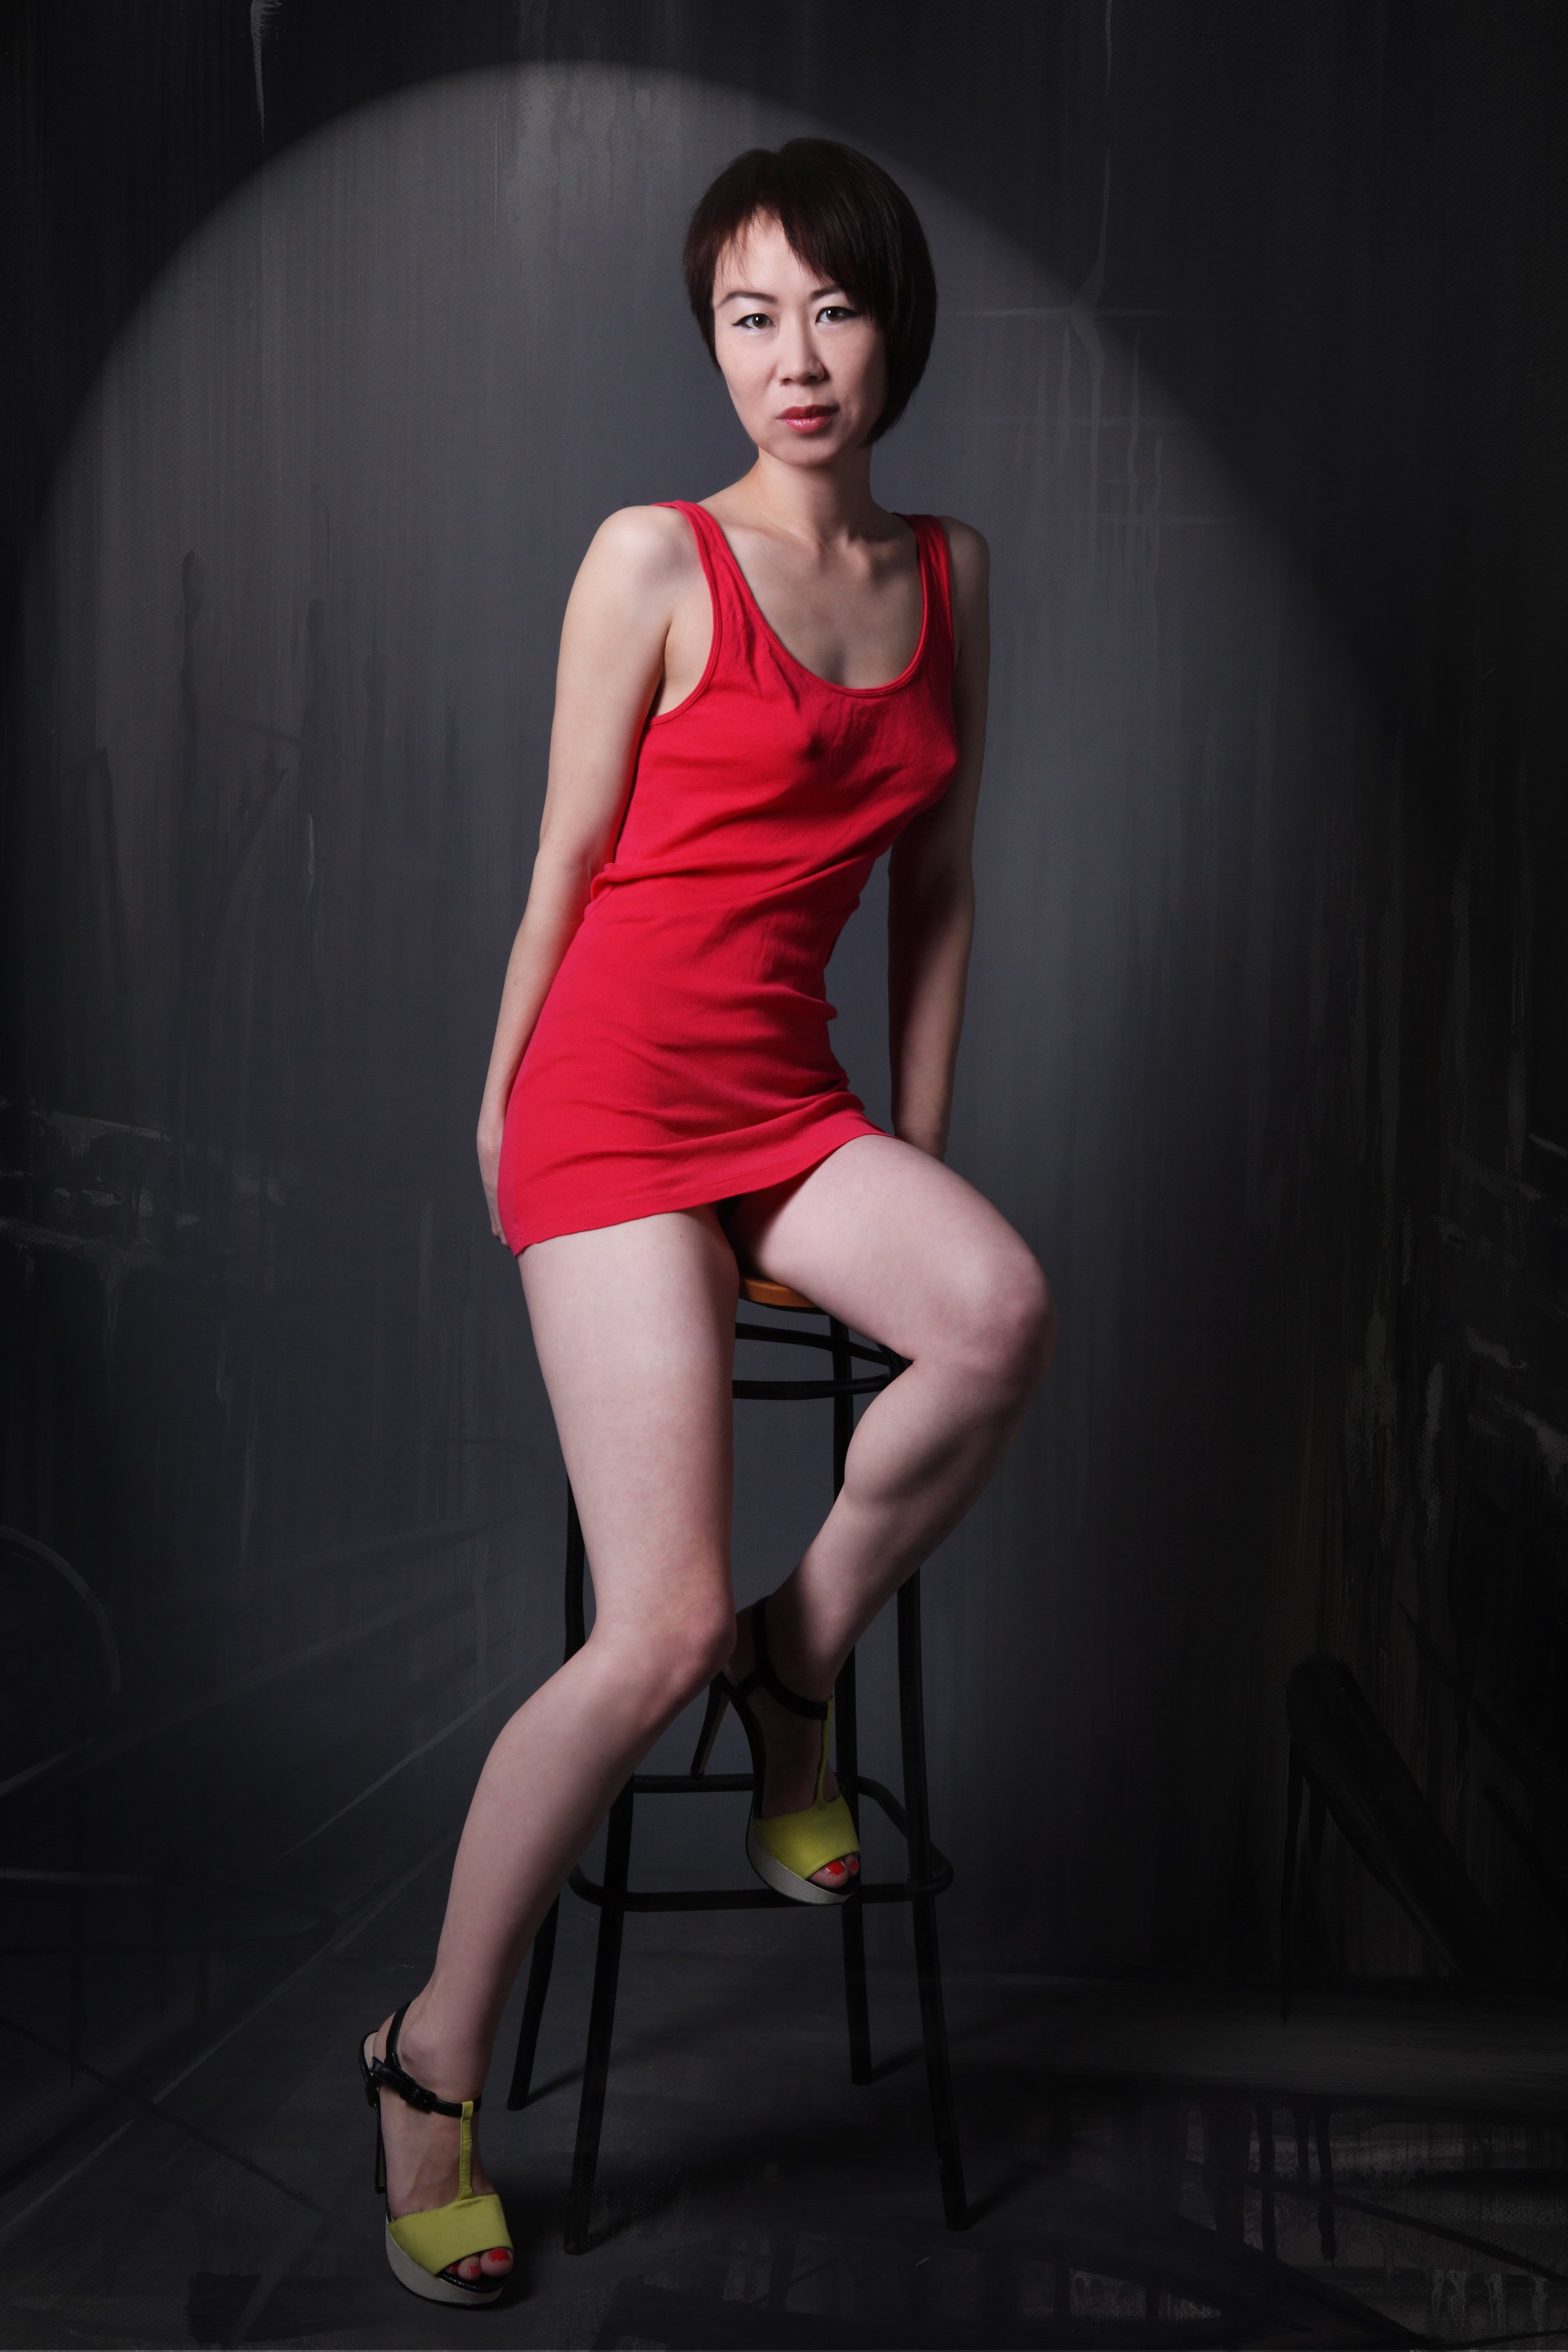 Снять проститутку Мизуми, Array, у метро , в районе